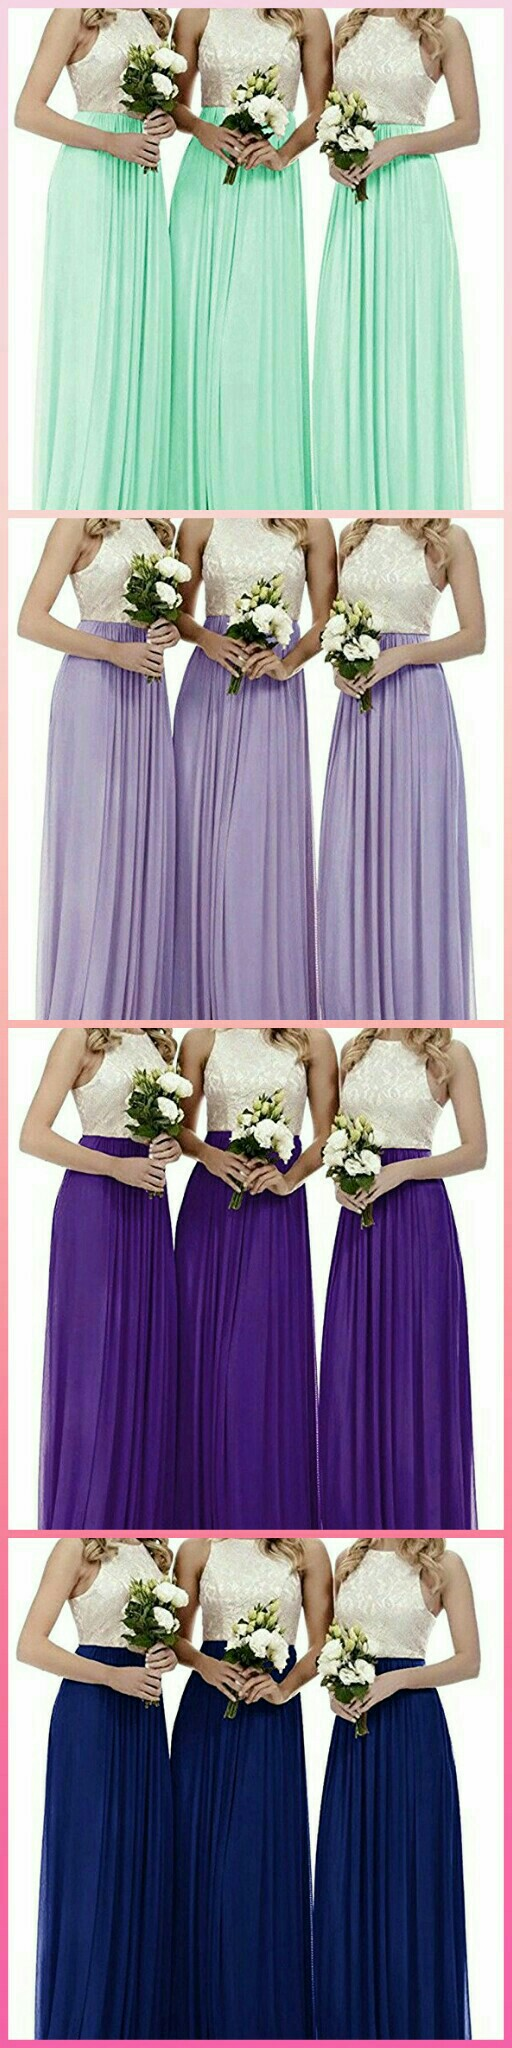 Royal blue wedding dresses plus size  ZVOCY Womenus Halter Lace Chiffon Bridesmaid Dresses Long Wedding